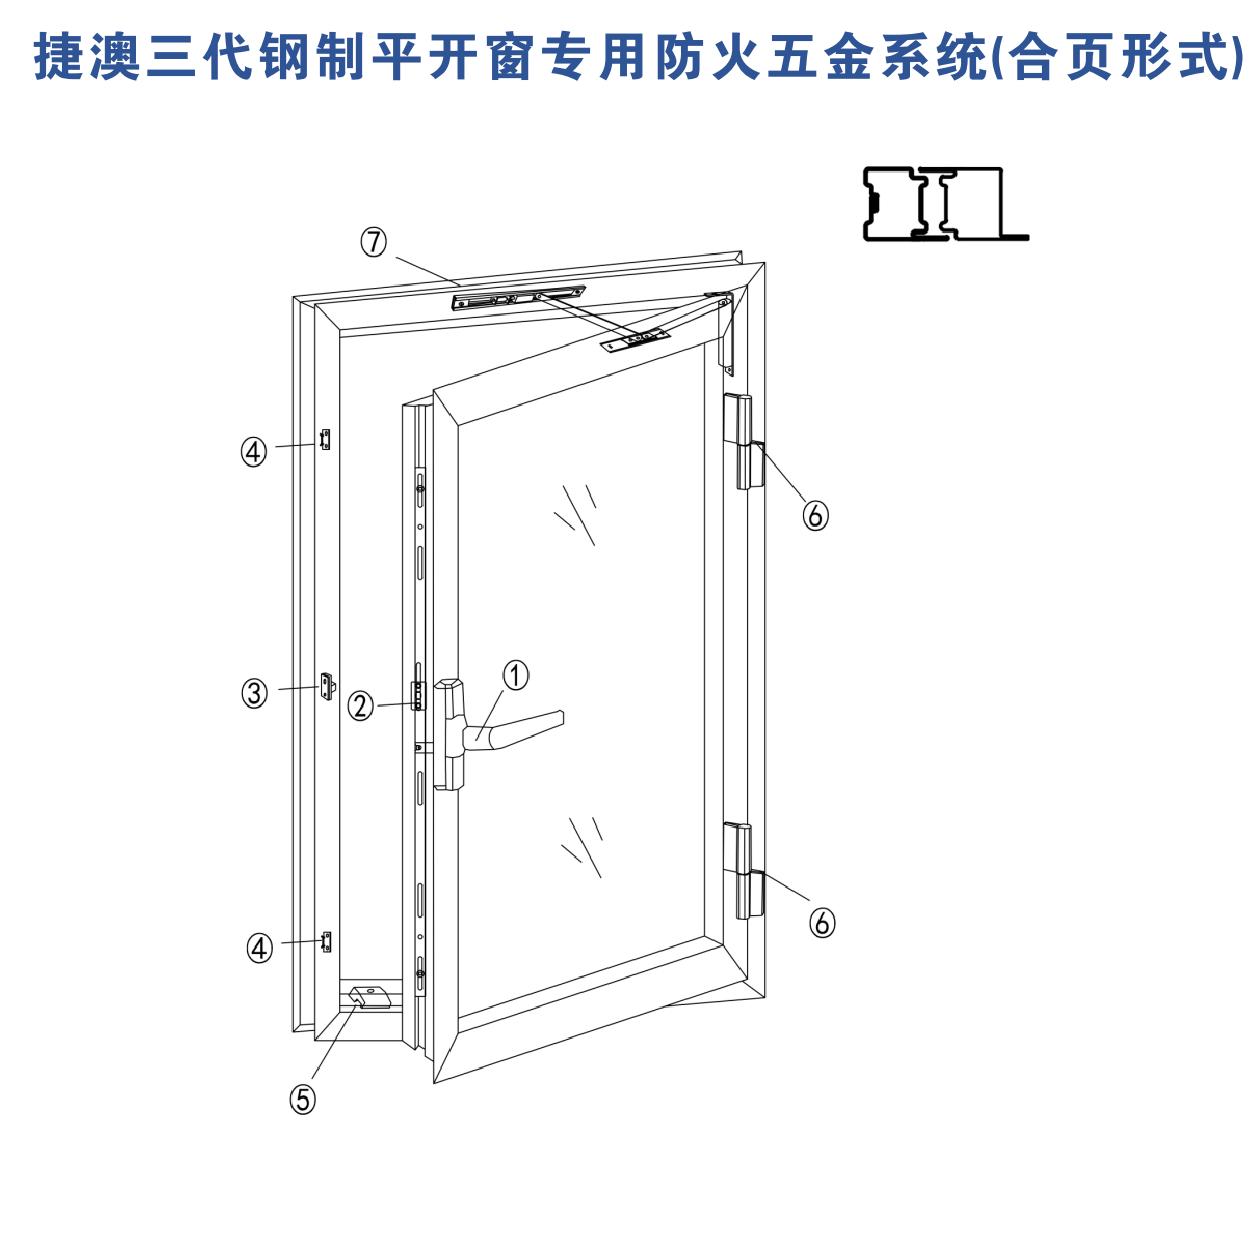 Special fireproof hardware system for Jieao steel casement window (hinge form)